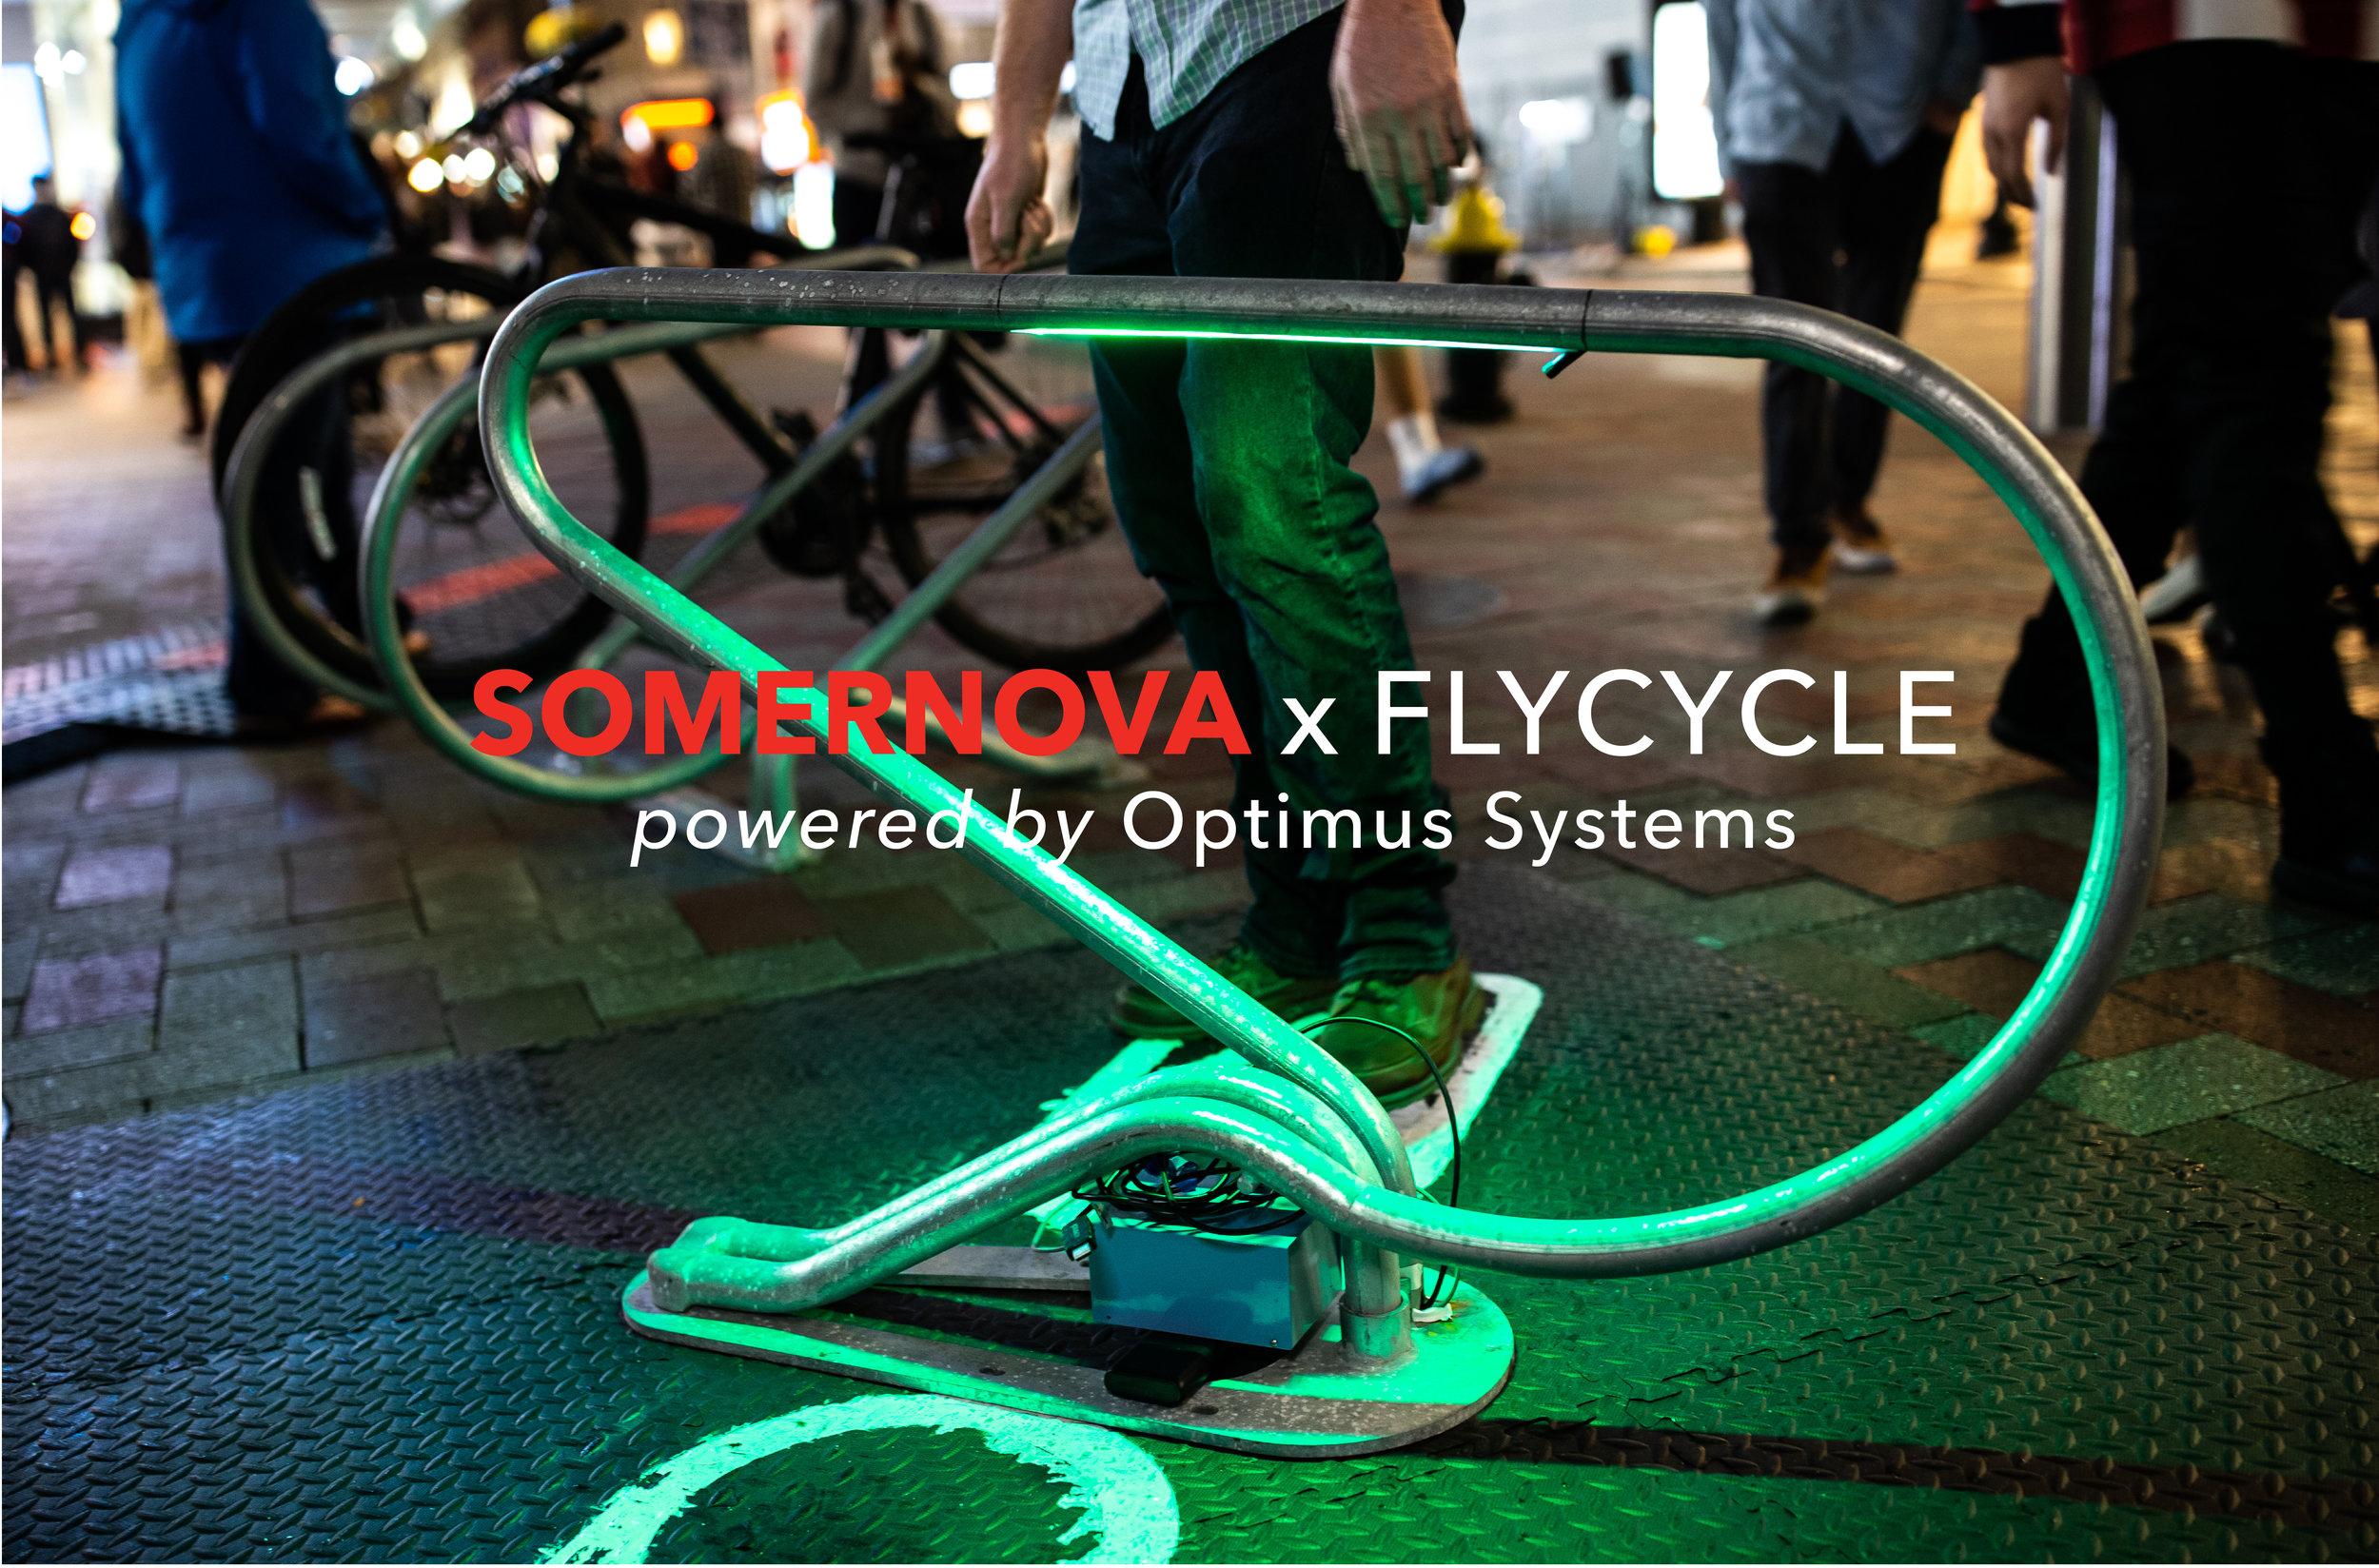 Somernova x Flycycle title only.jpg